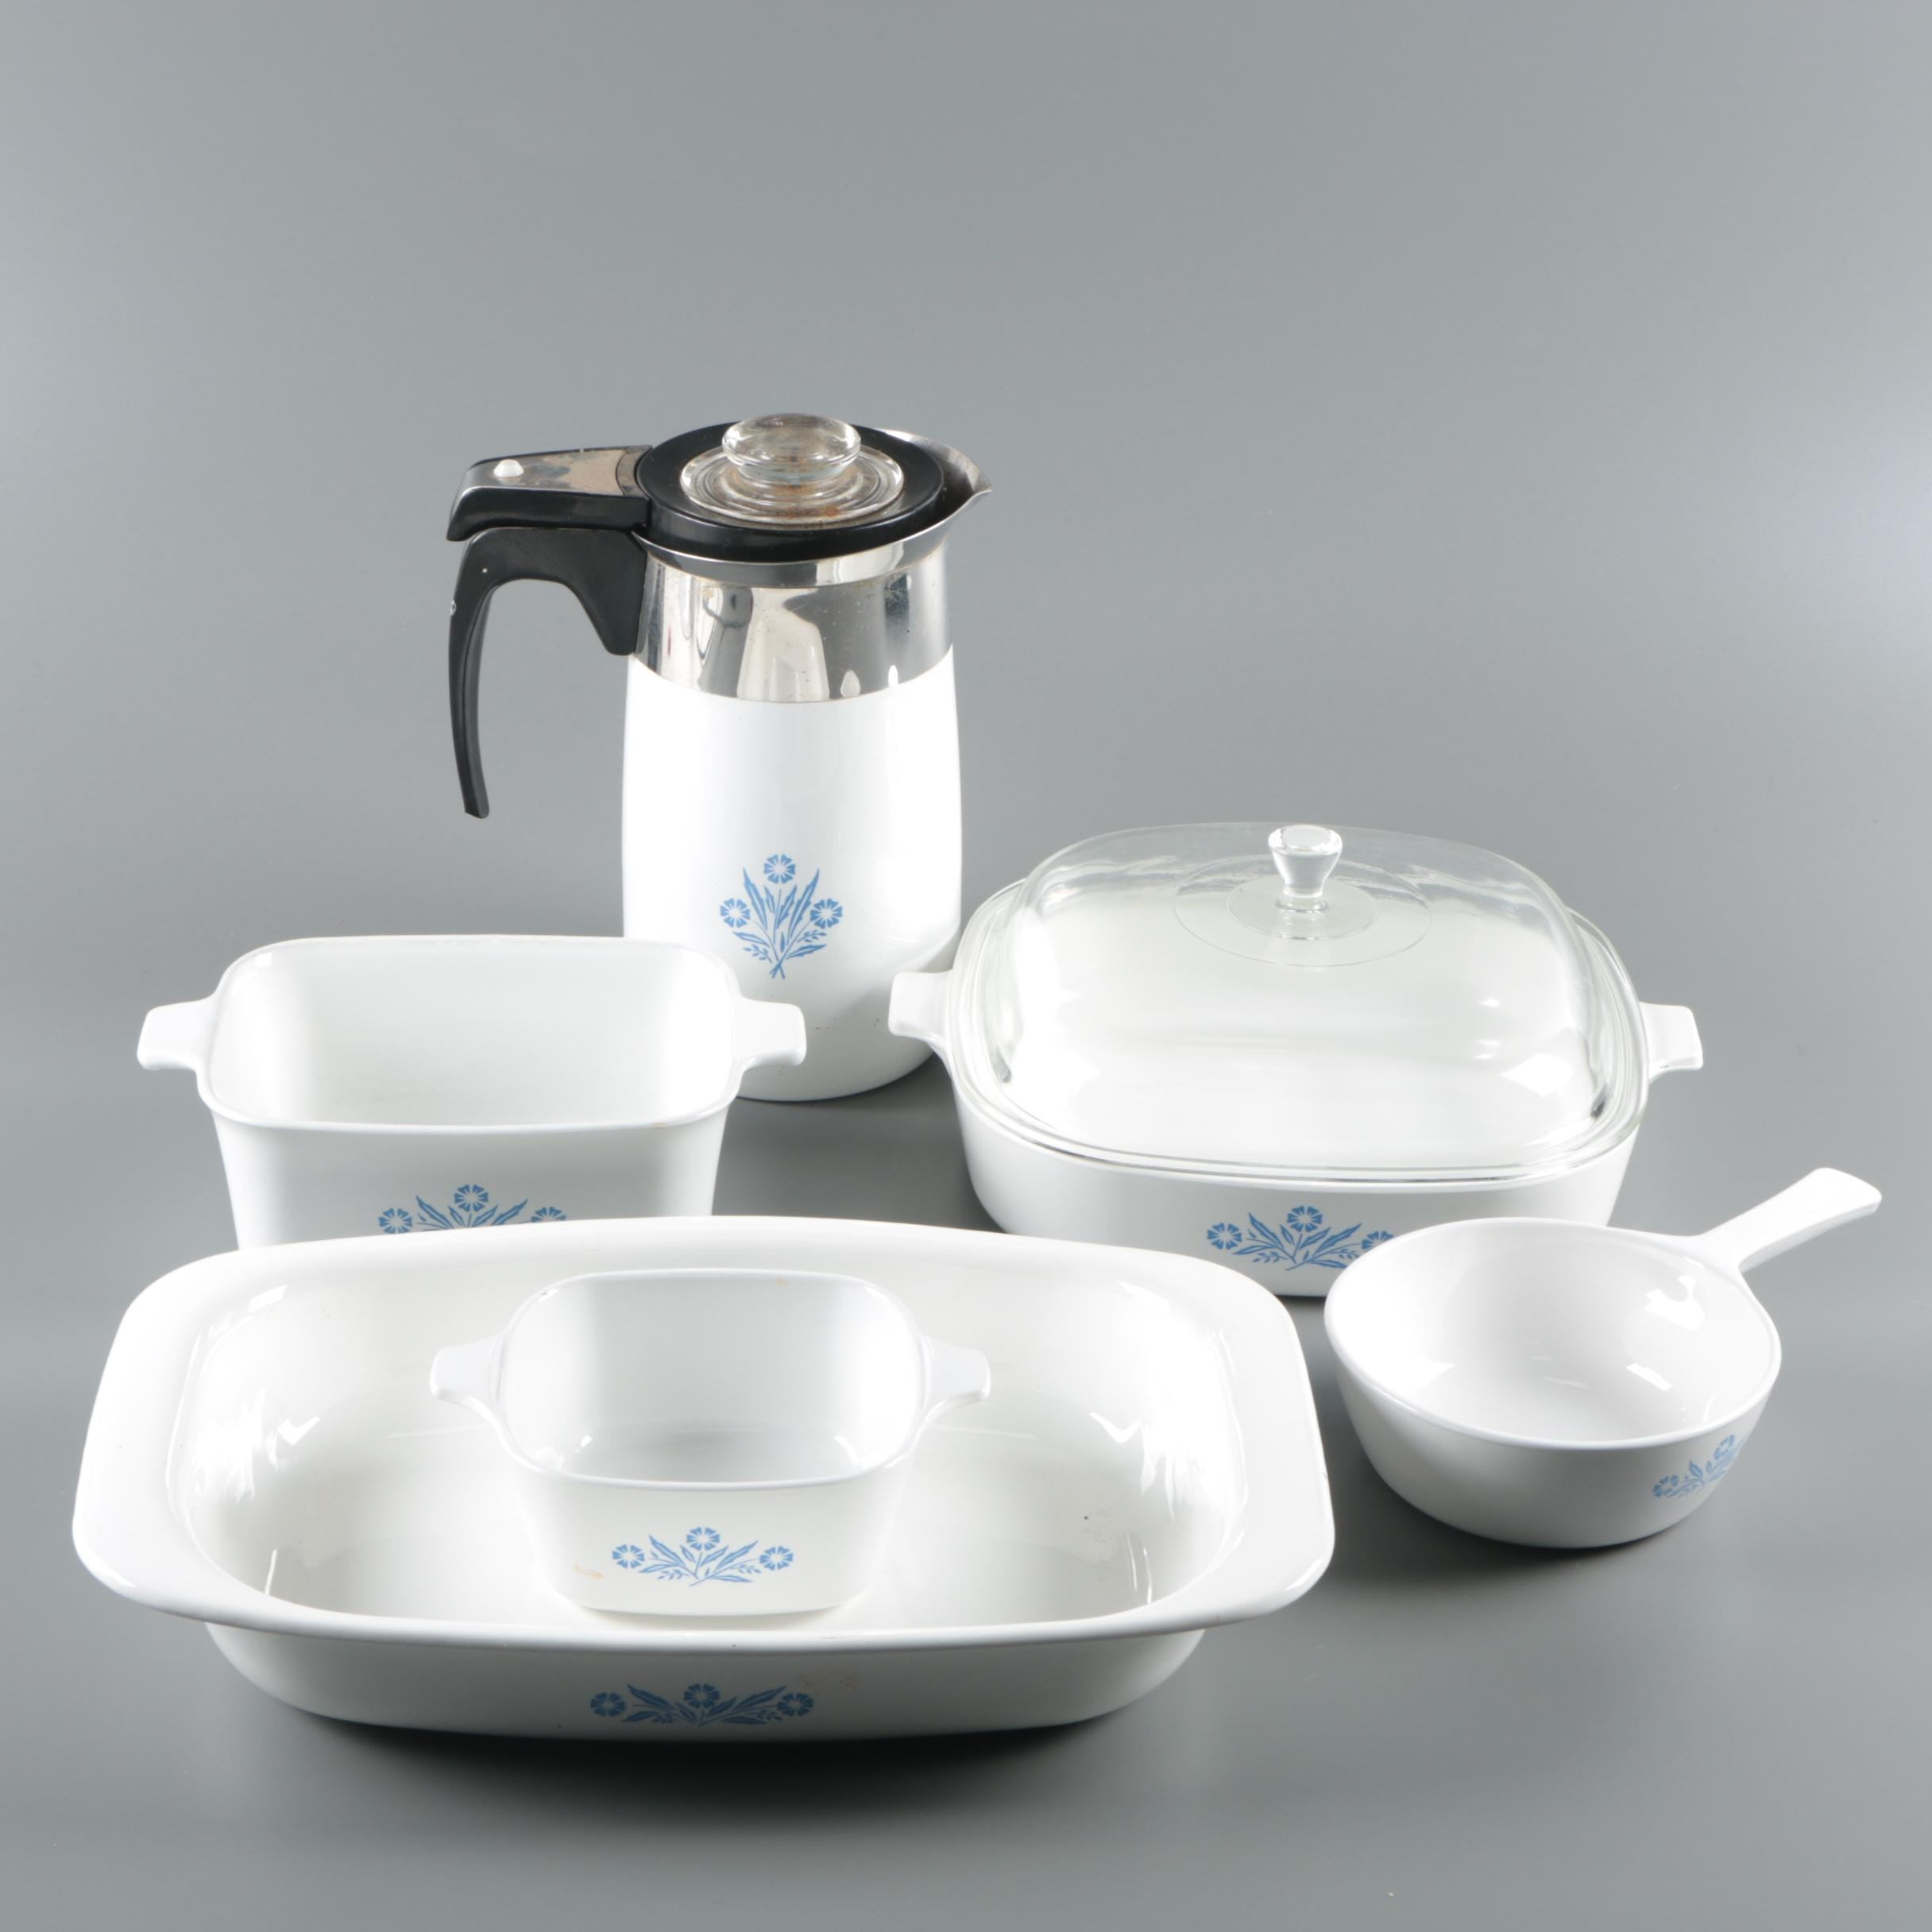 "Vintage CorningWare ""Cornflower Blue"" Bakeware and Serveware"